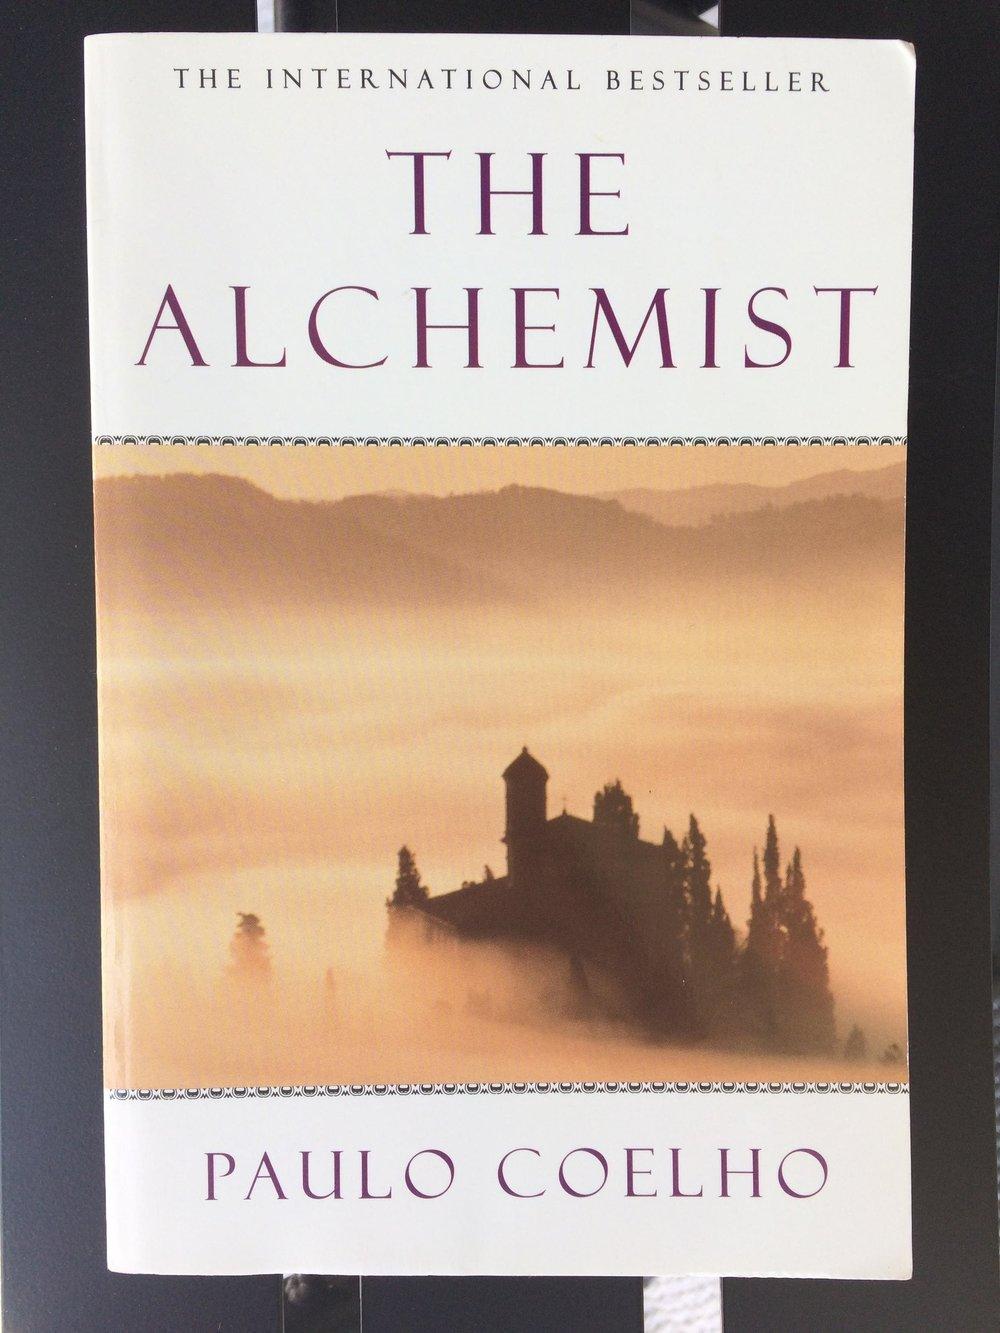 the alchemist by paulo coelho essay A literary analysis of the alchemist by paulo coelho  view full essay more essays like this: paulo coelho, literary analysis  sign up to view the complete essay.